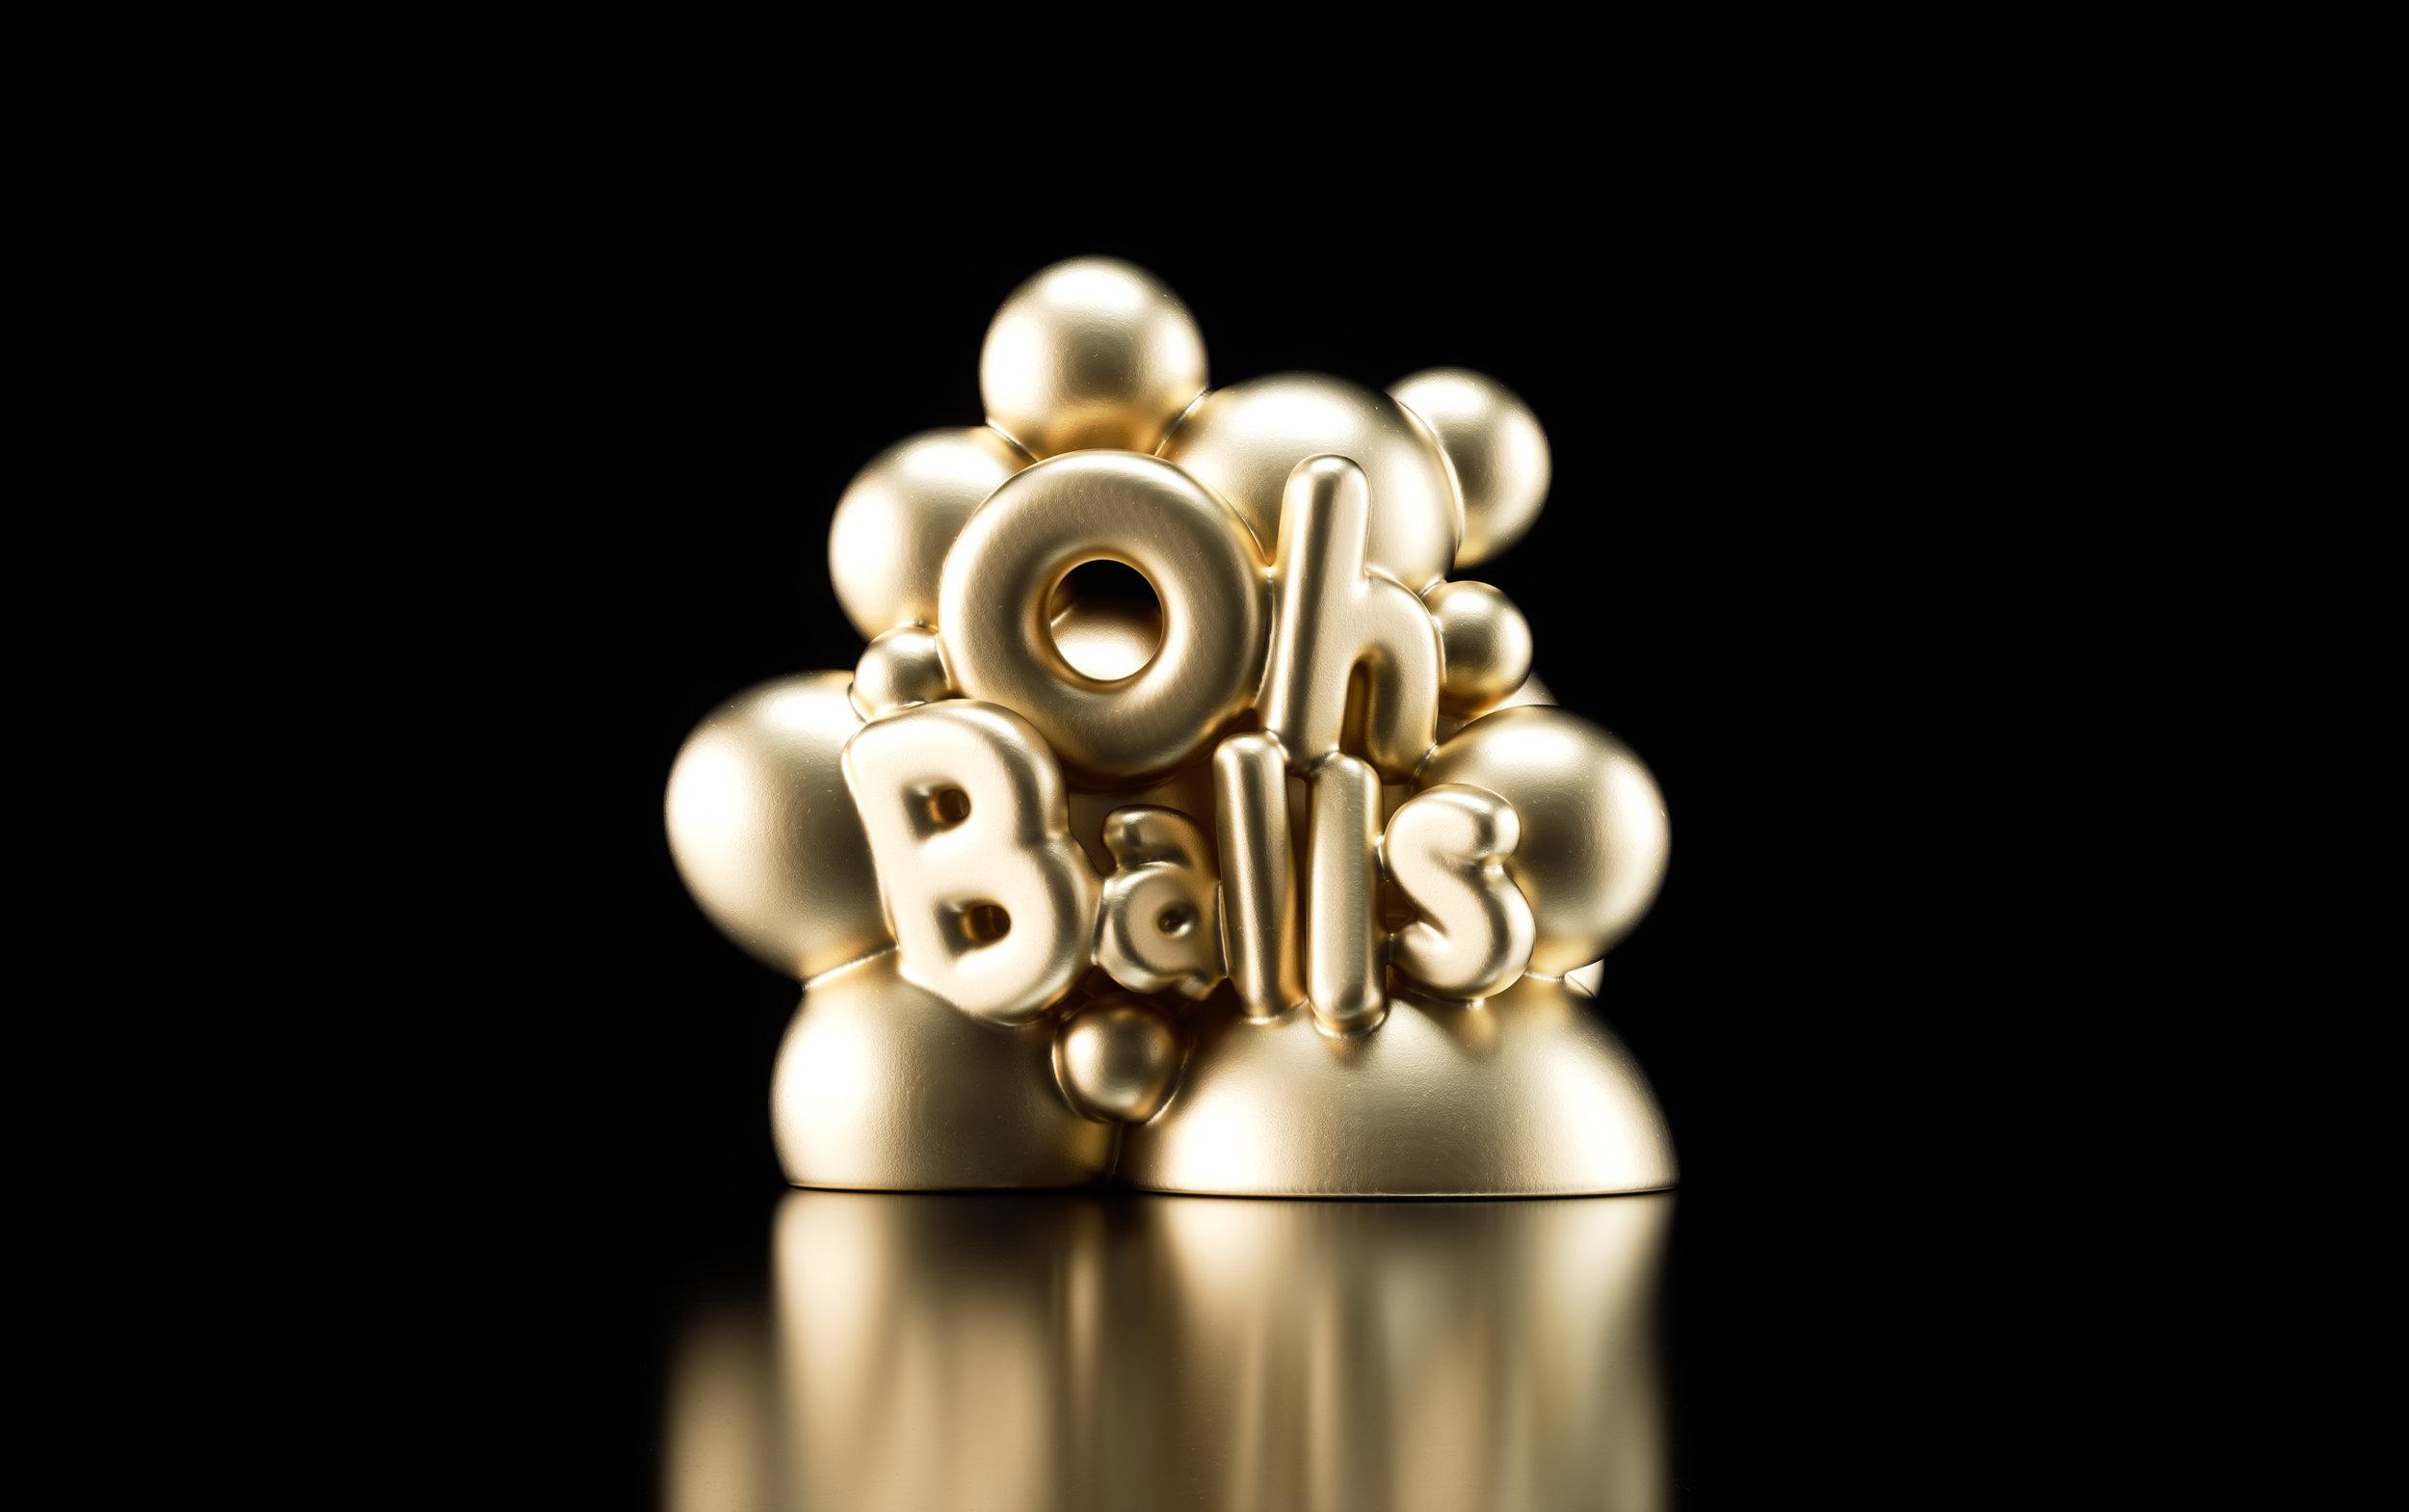 OhBalls_Sculpture_BenFearnley_Wide_GoldOnBlack.jpg